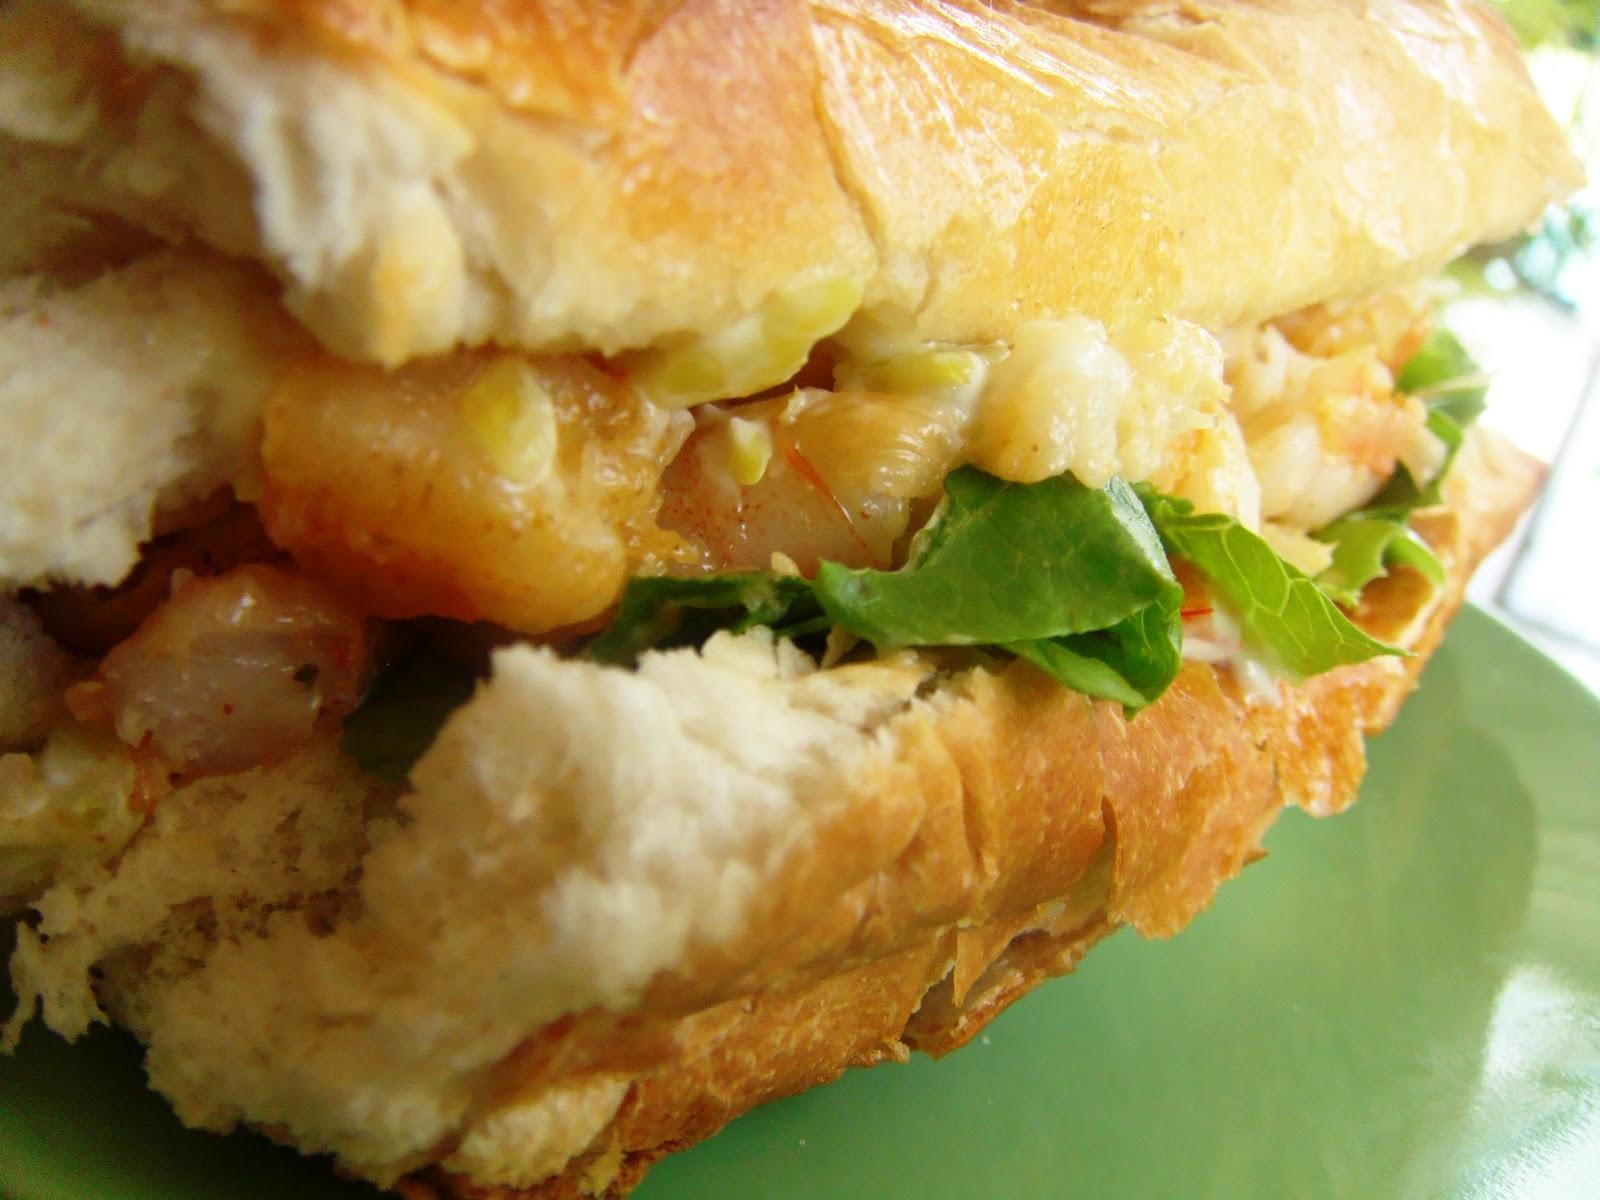 Creamy Shrimp Sandwich with Chipotle-Lime Mayonnaise ...